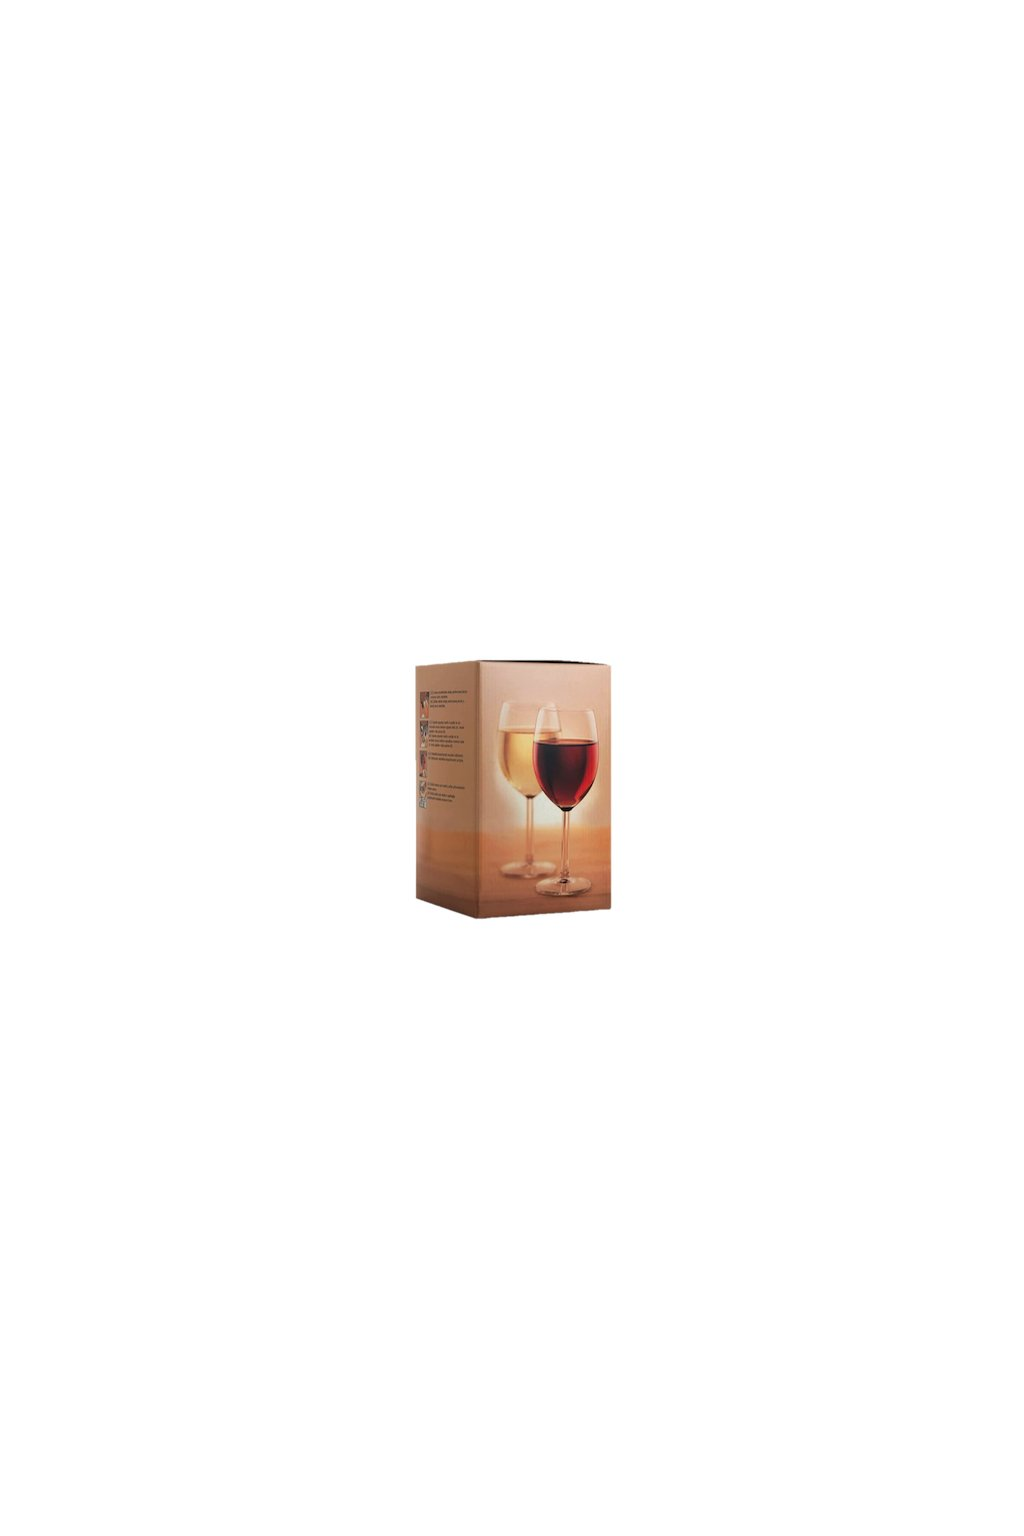 Bag in Box - víno bílé, 5 litrů